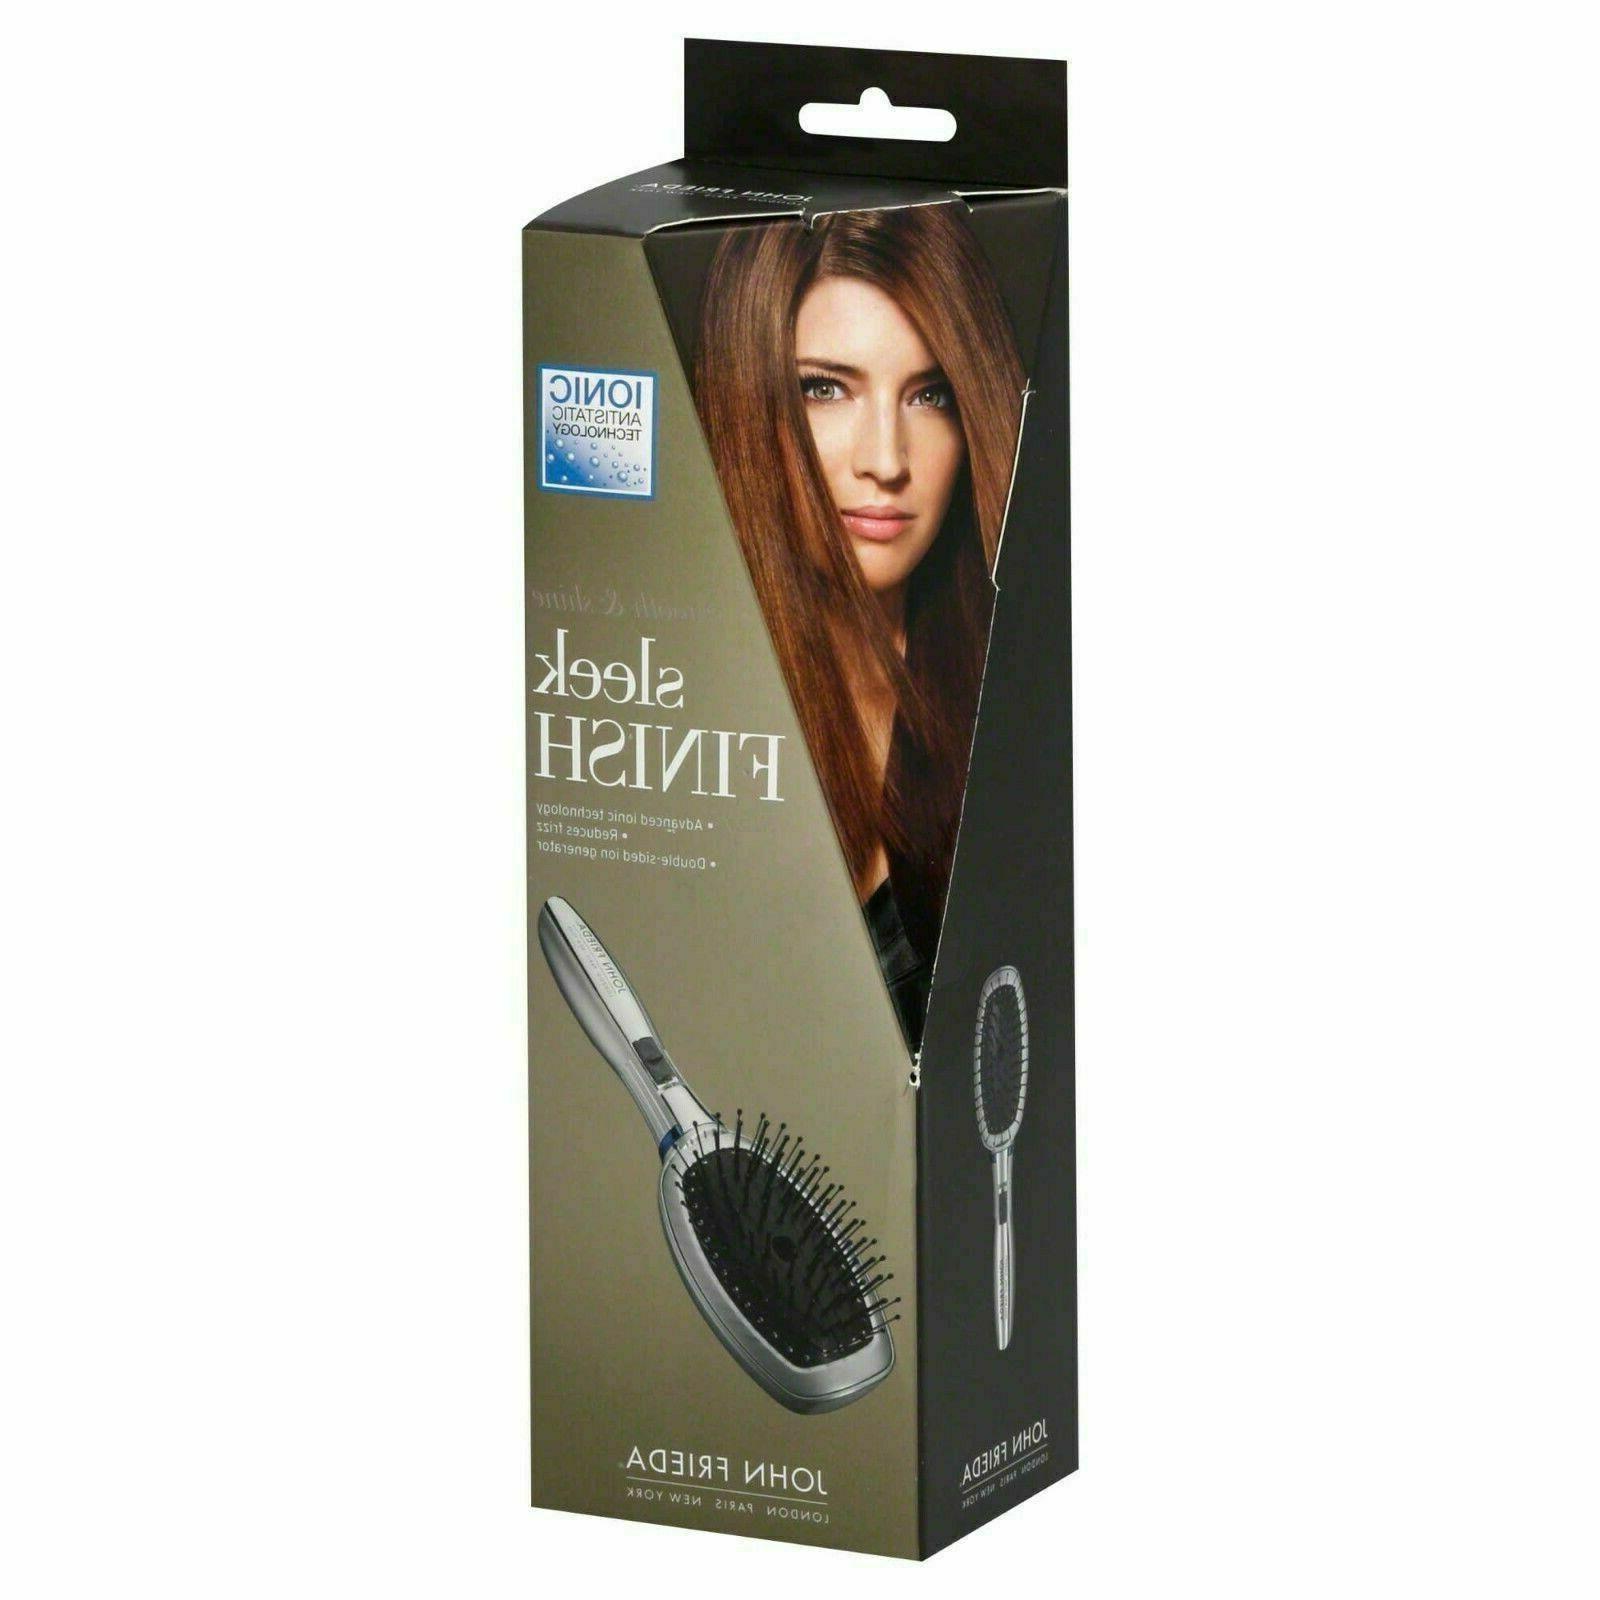 ionic antistatic conair hair brush new in